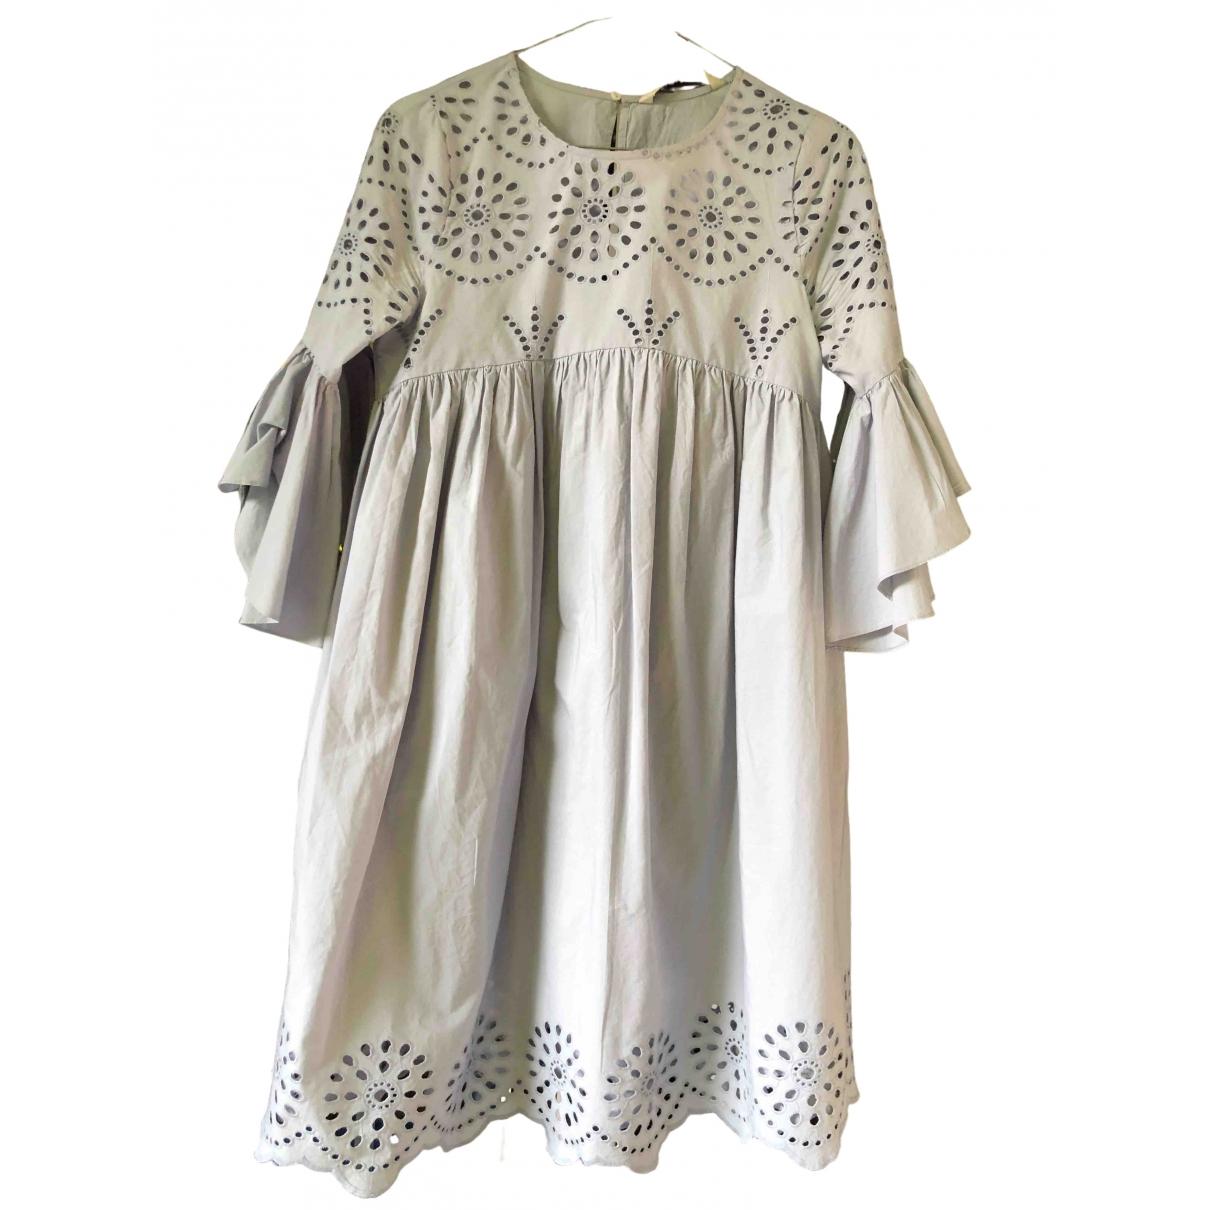 Zara \N Cotton dress for Women XS International